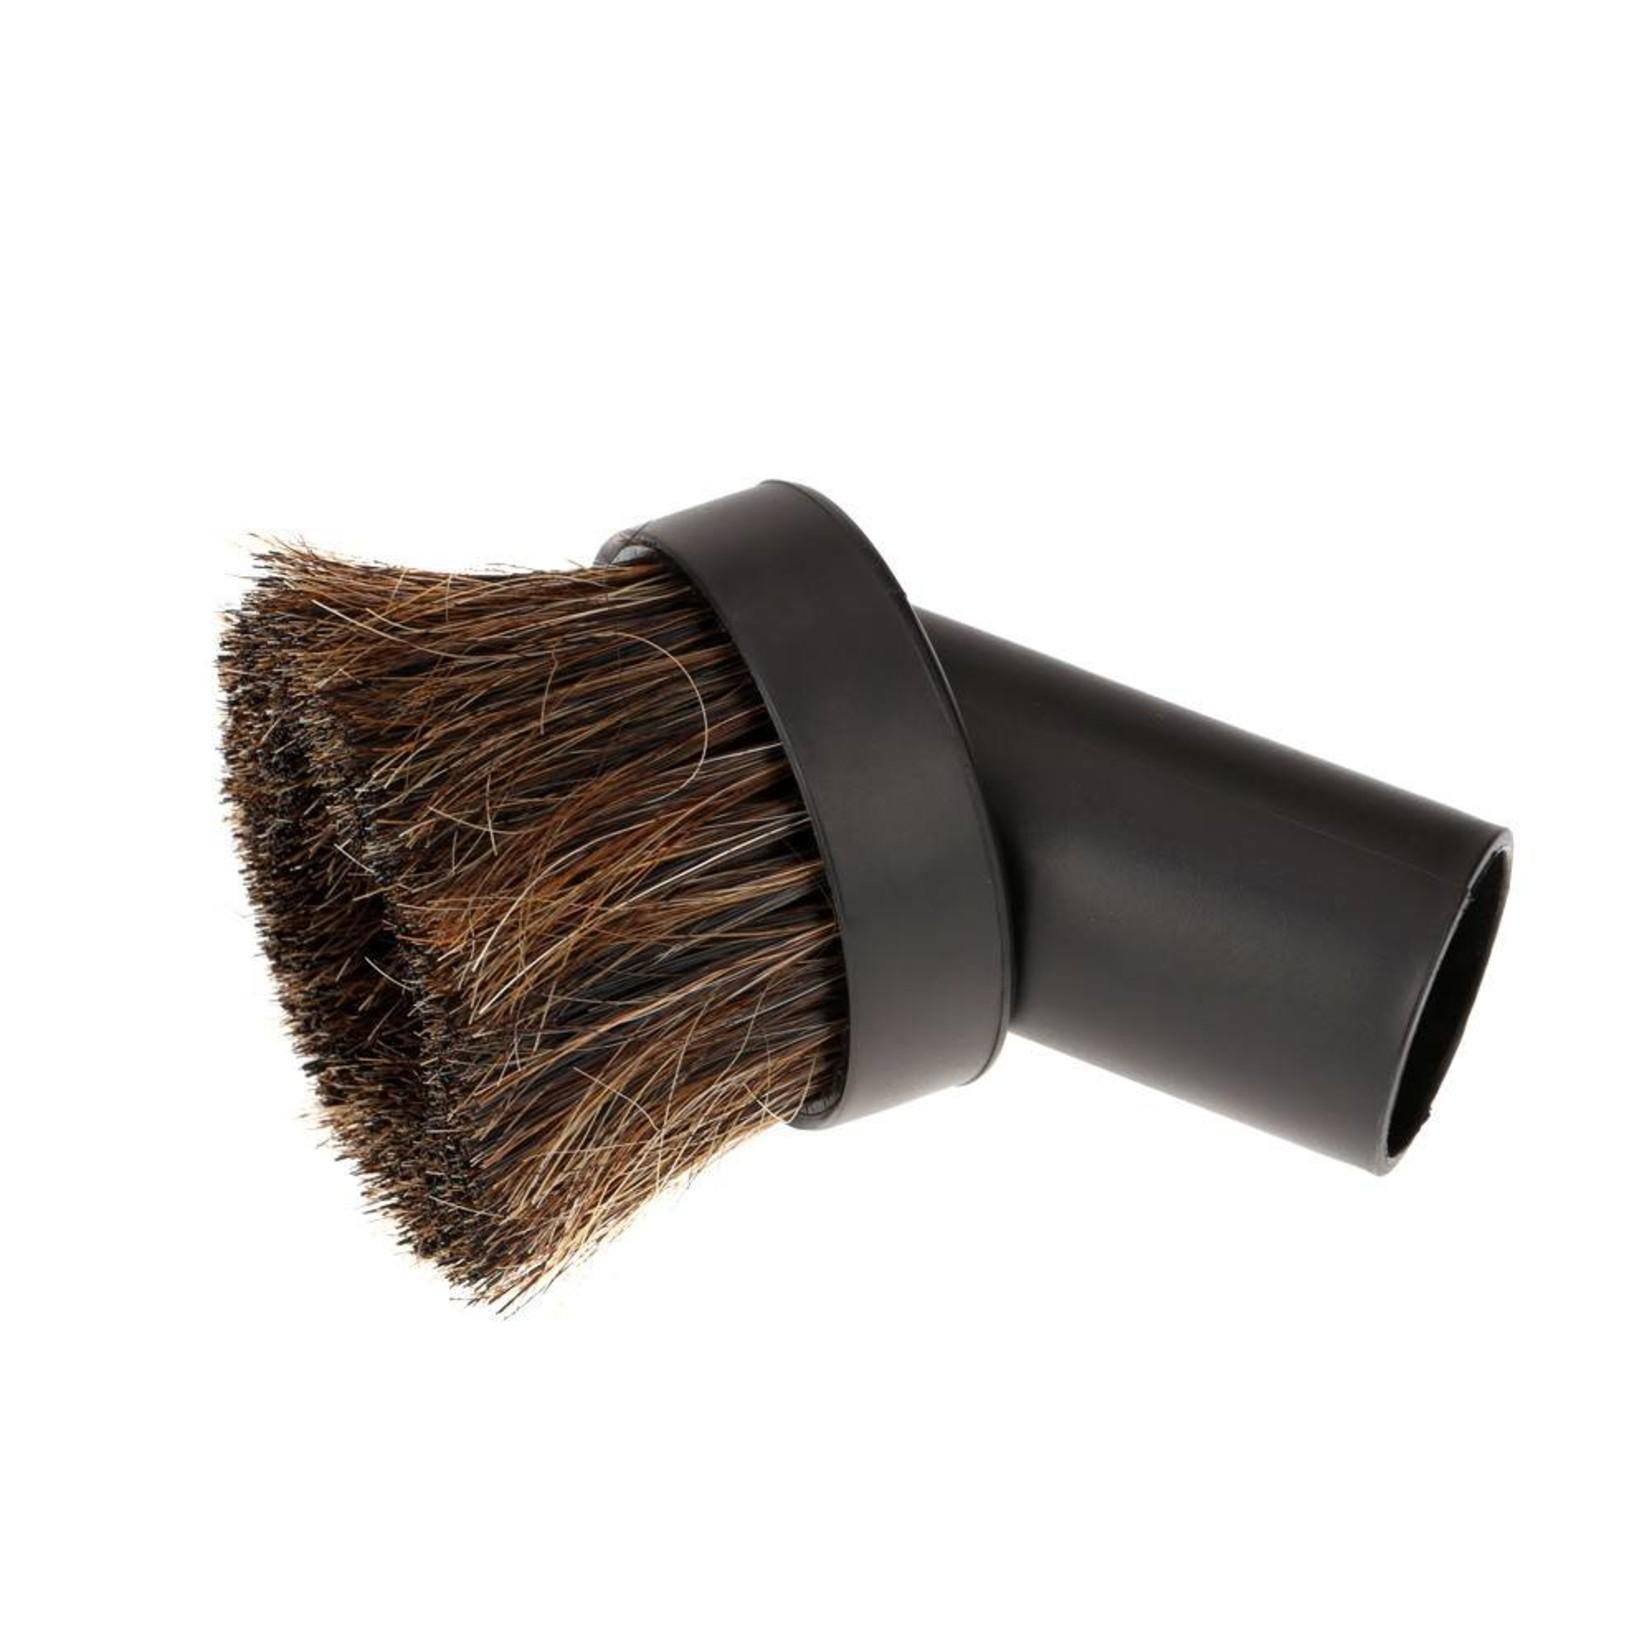 Swiss Boy CVS Round Horse Hair Dusting Brush - Black